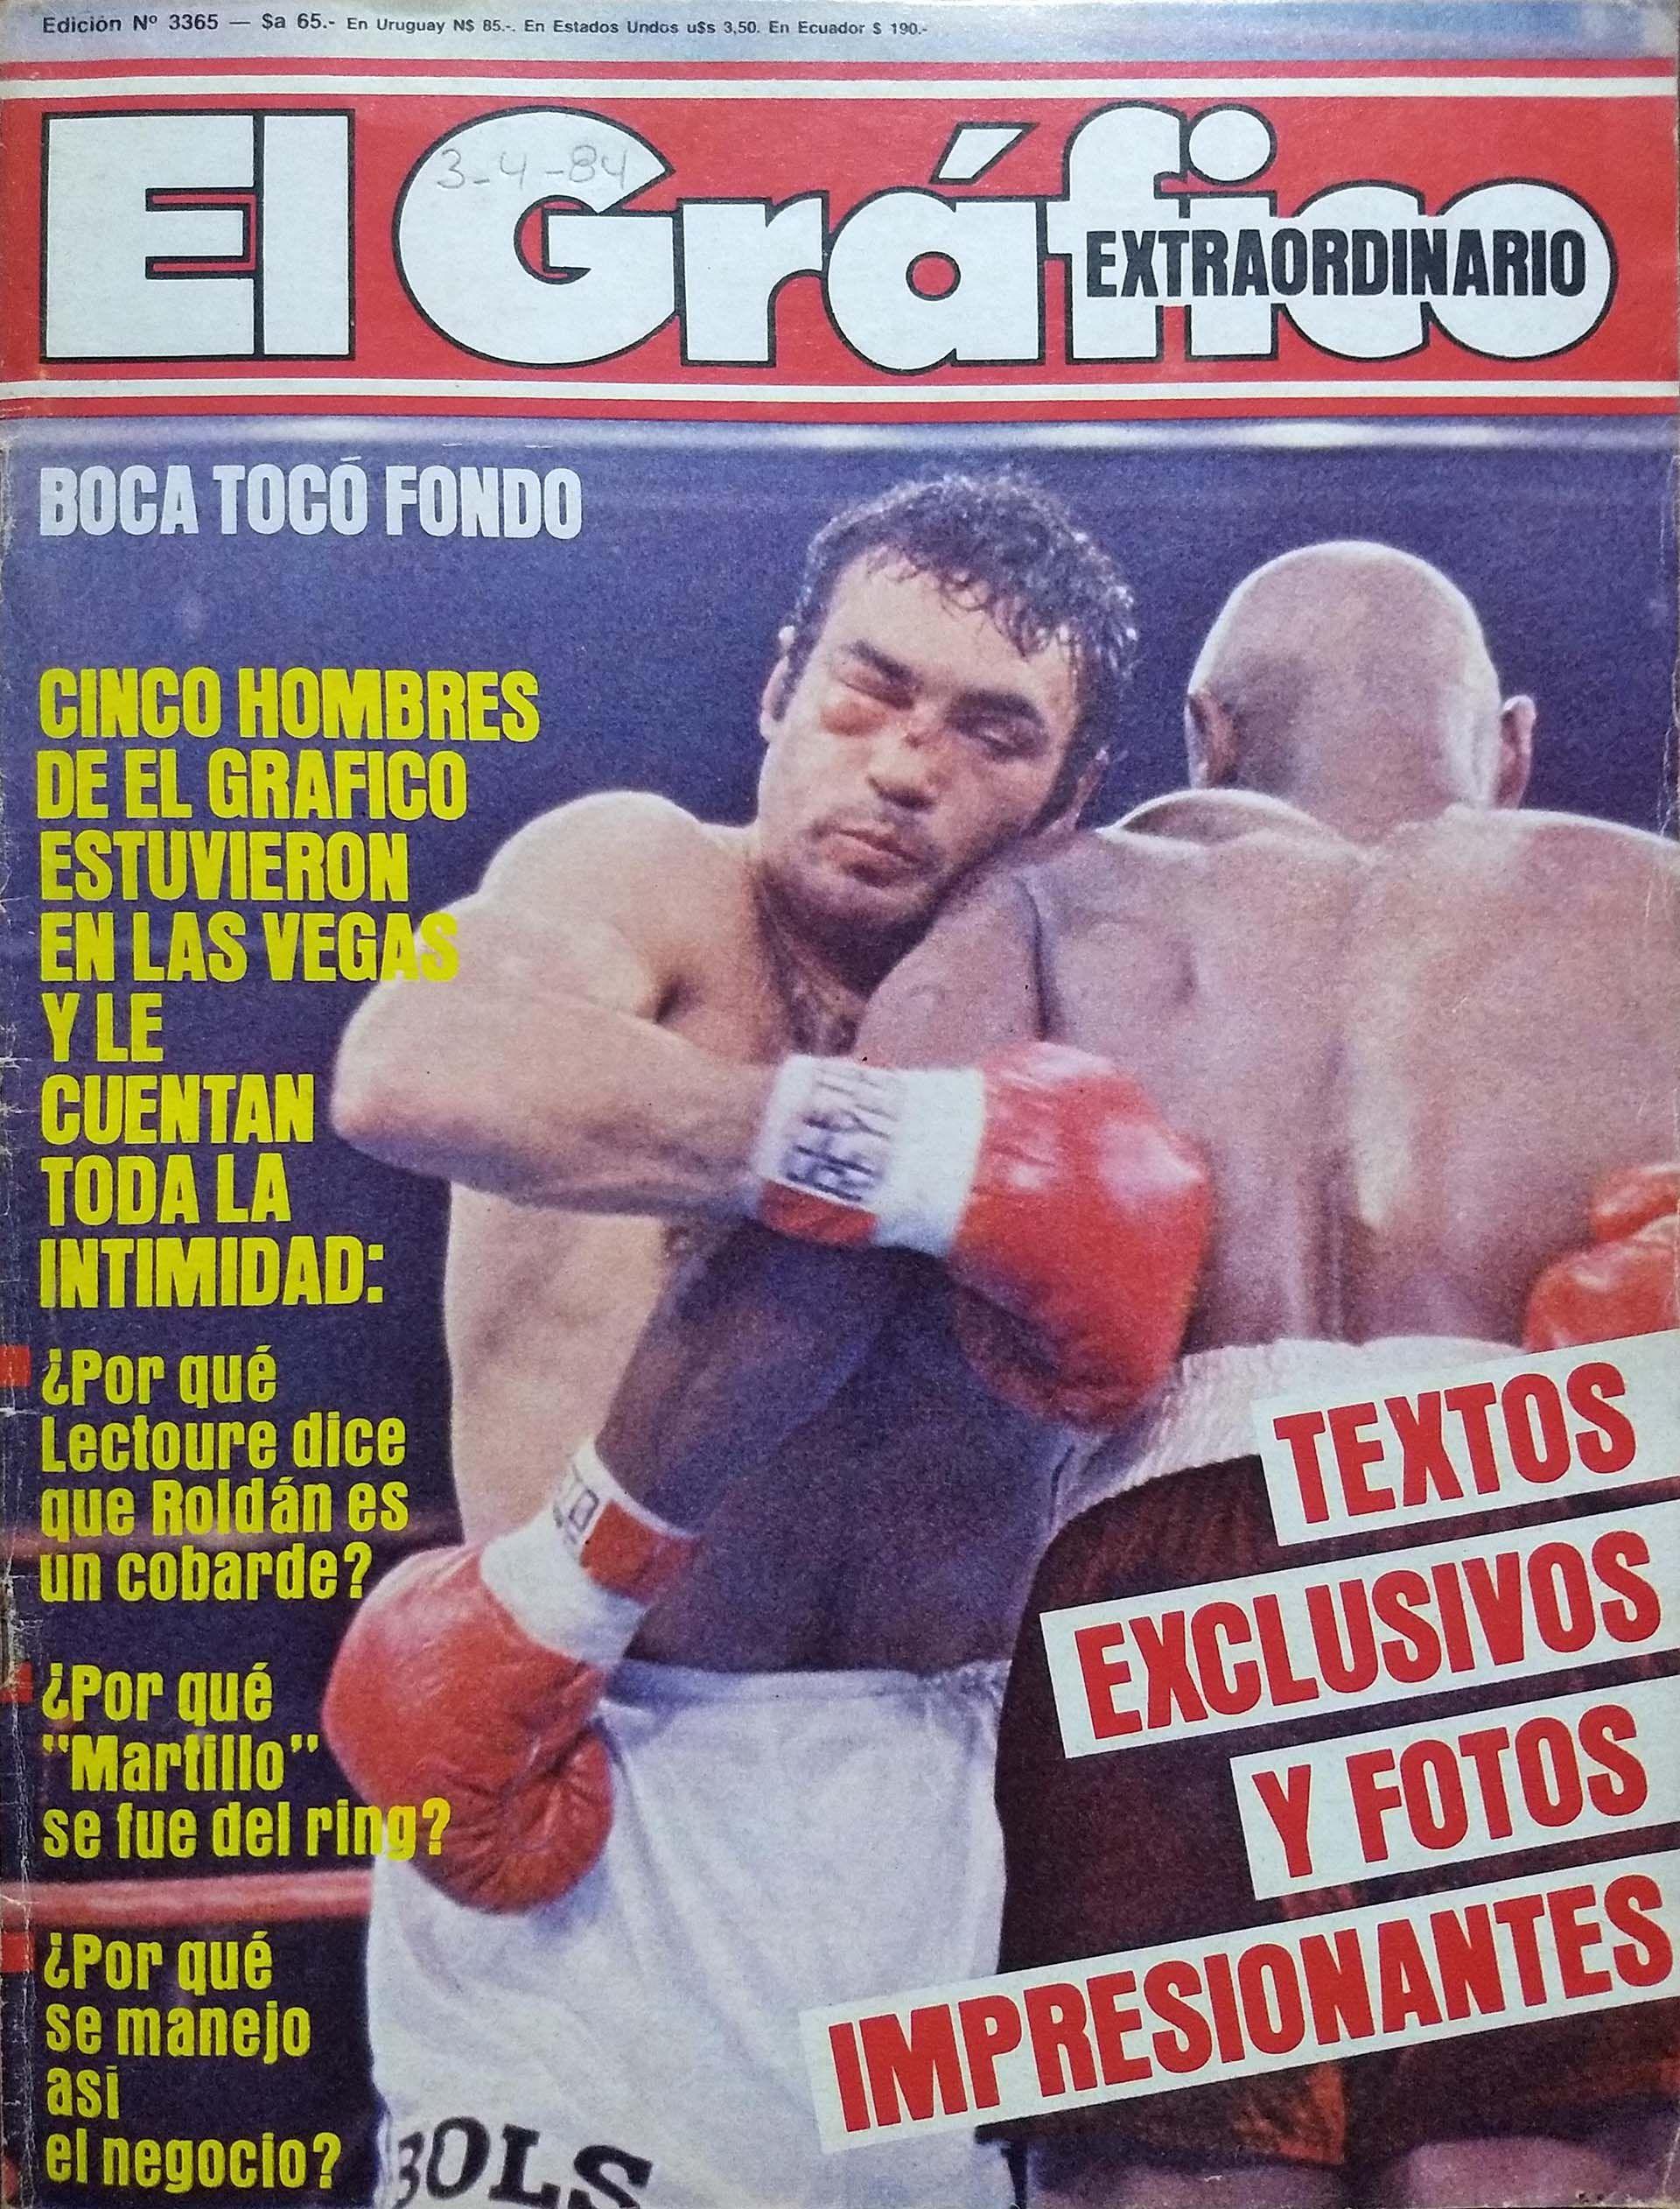 Juan Martillo Roldán